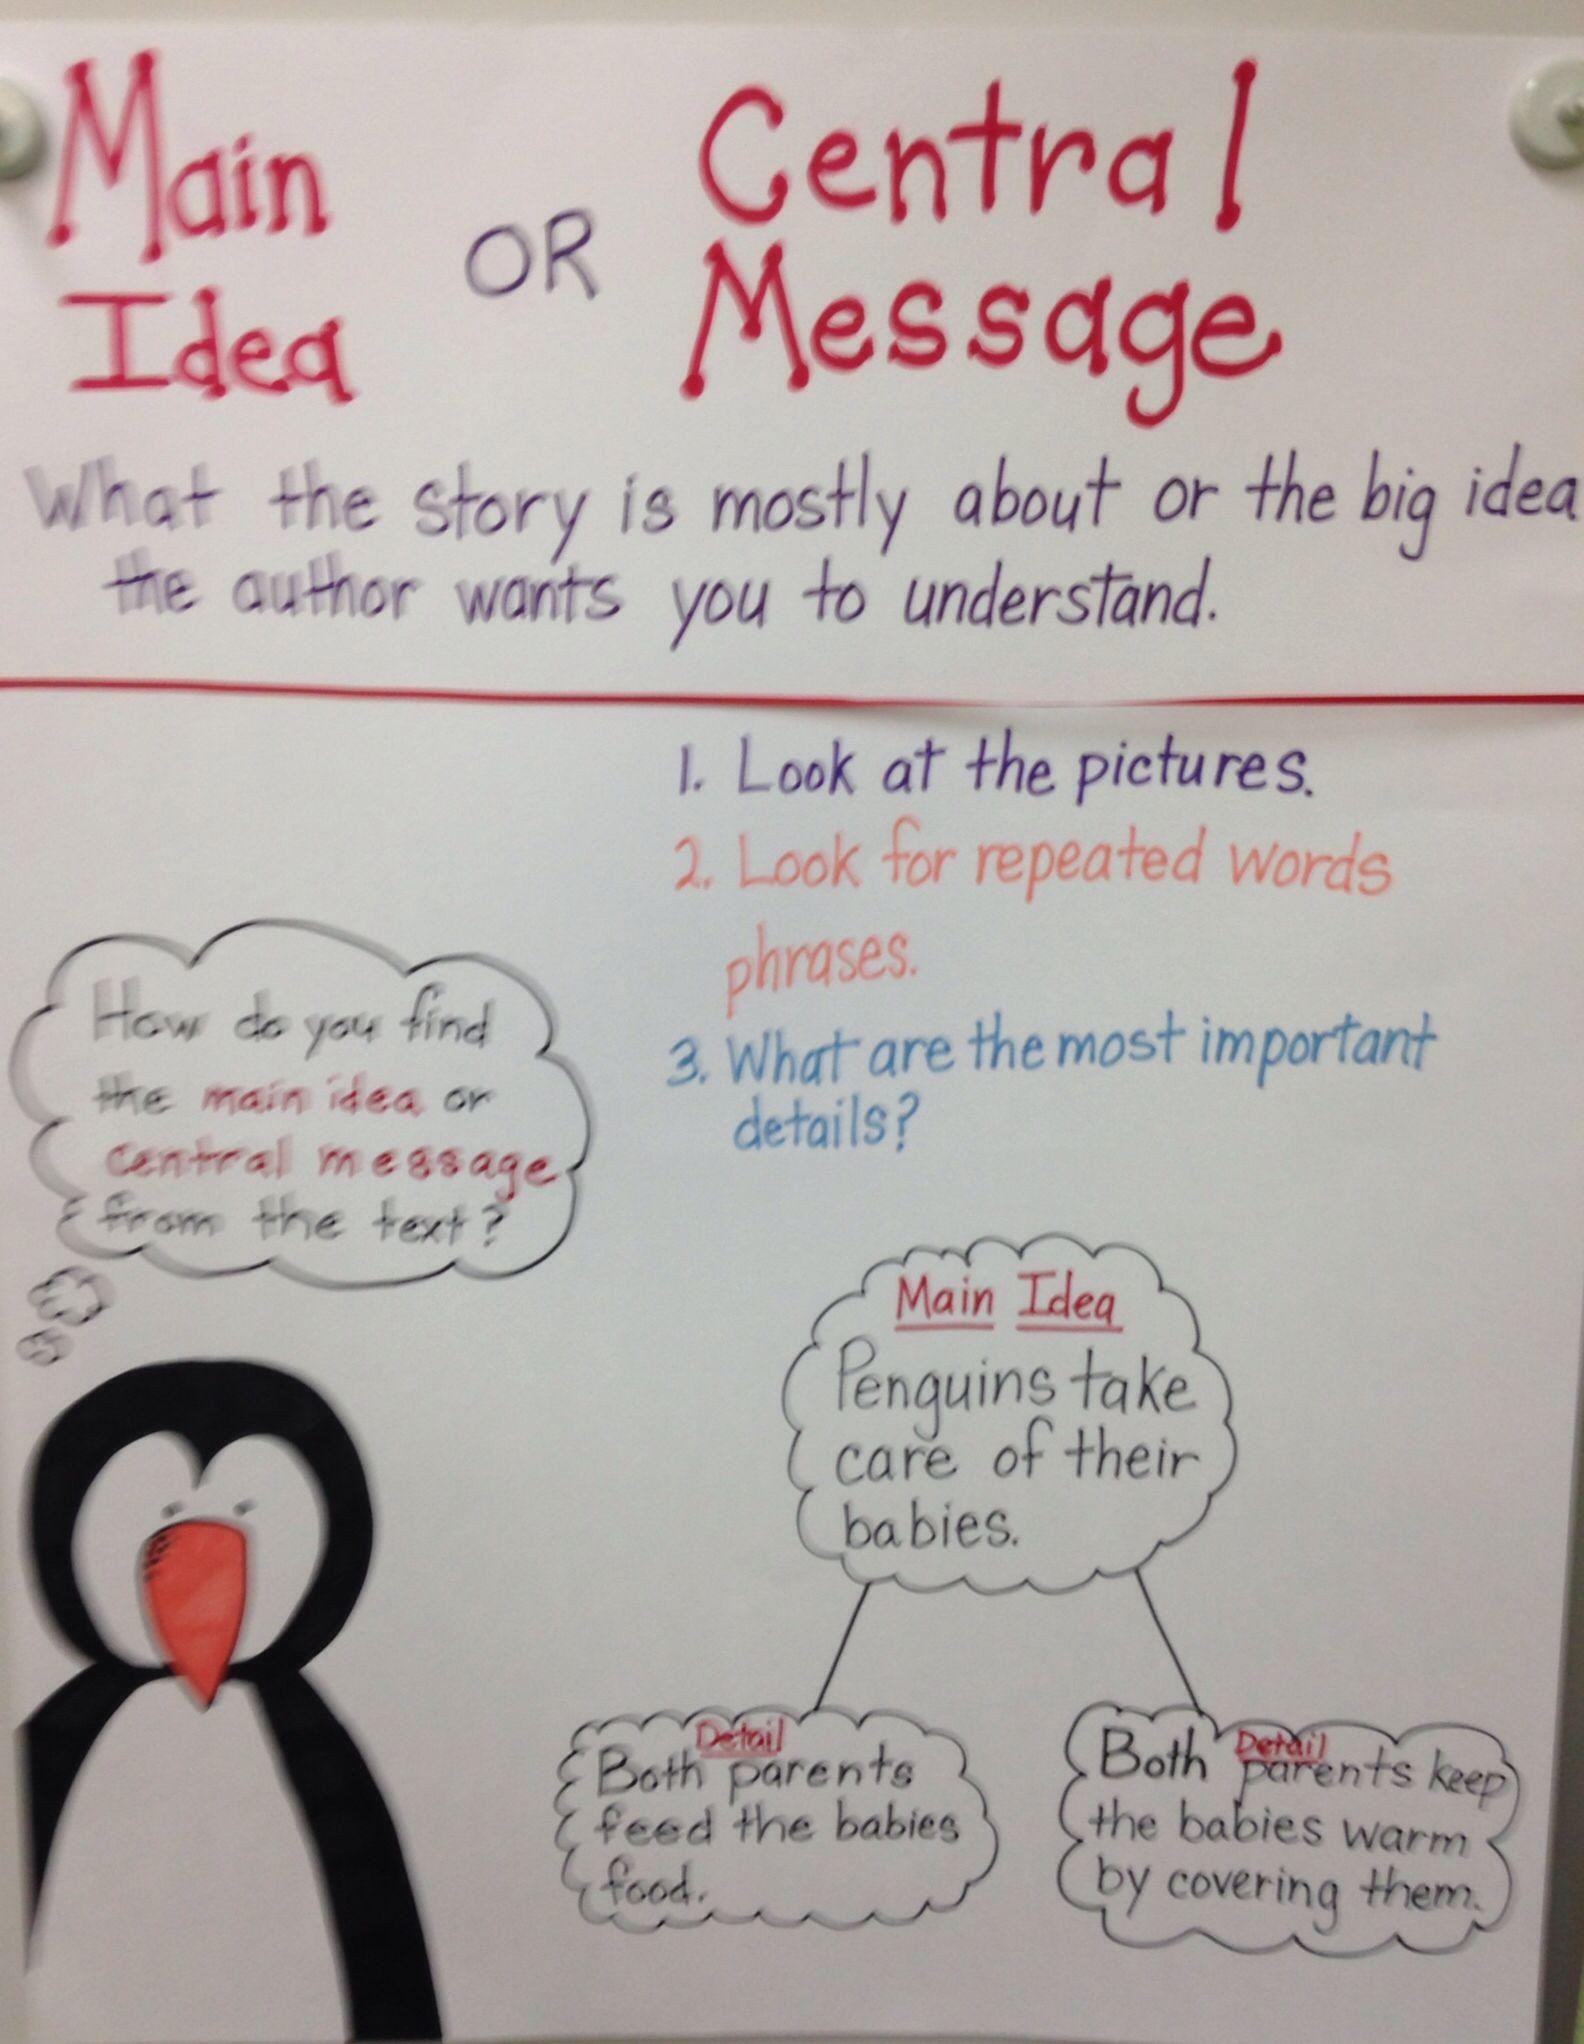 Main Idea Vs Theme Worksheet Main Idea Vs Central Message Third Grade Mon Core In 2021 Central Message Reading Skills Anchor Charts Main Idea Worksheet